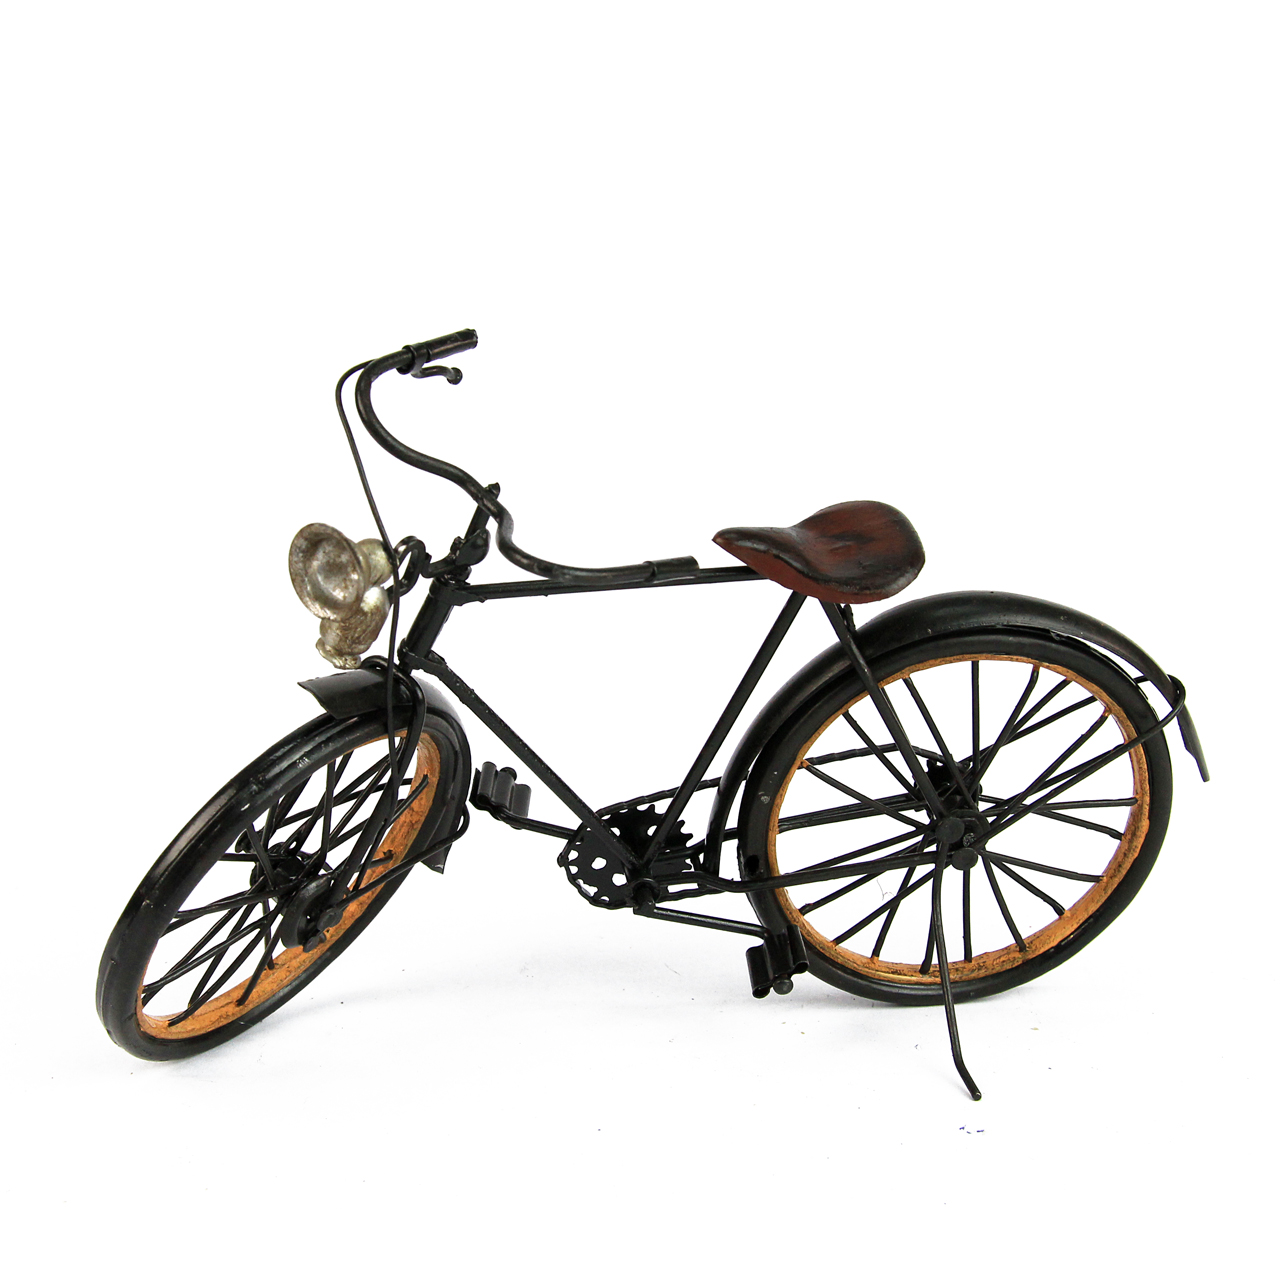 Macheta Bicicleta Din Metal Negru